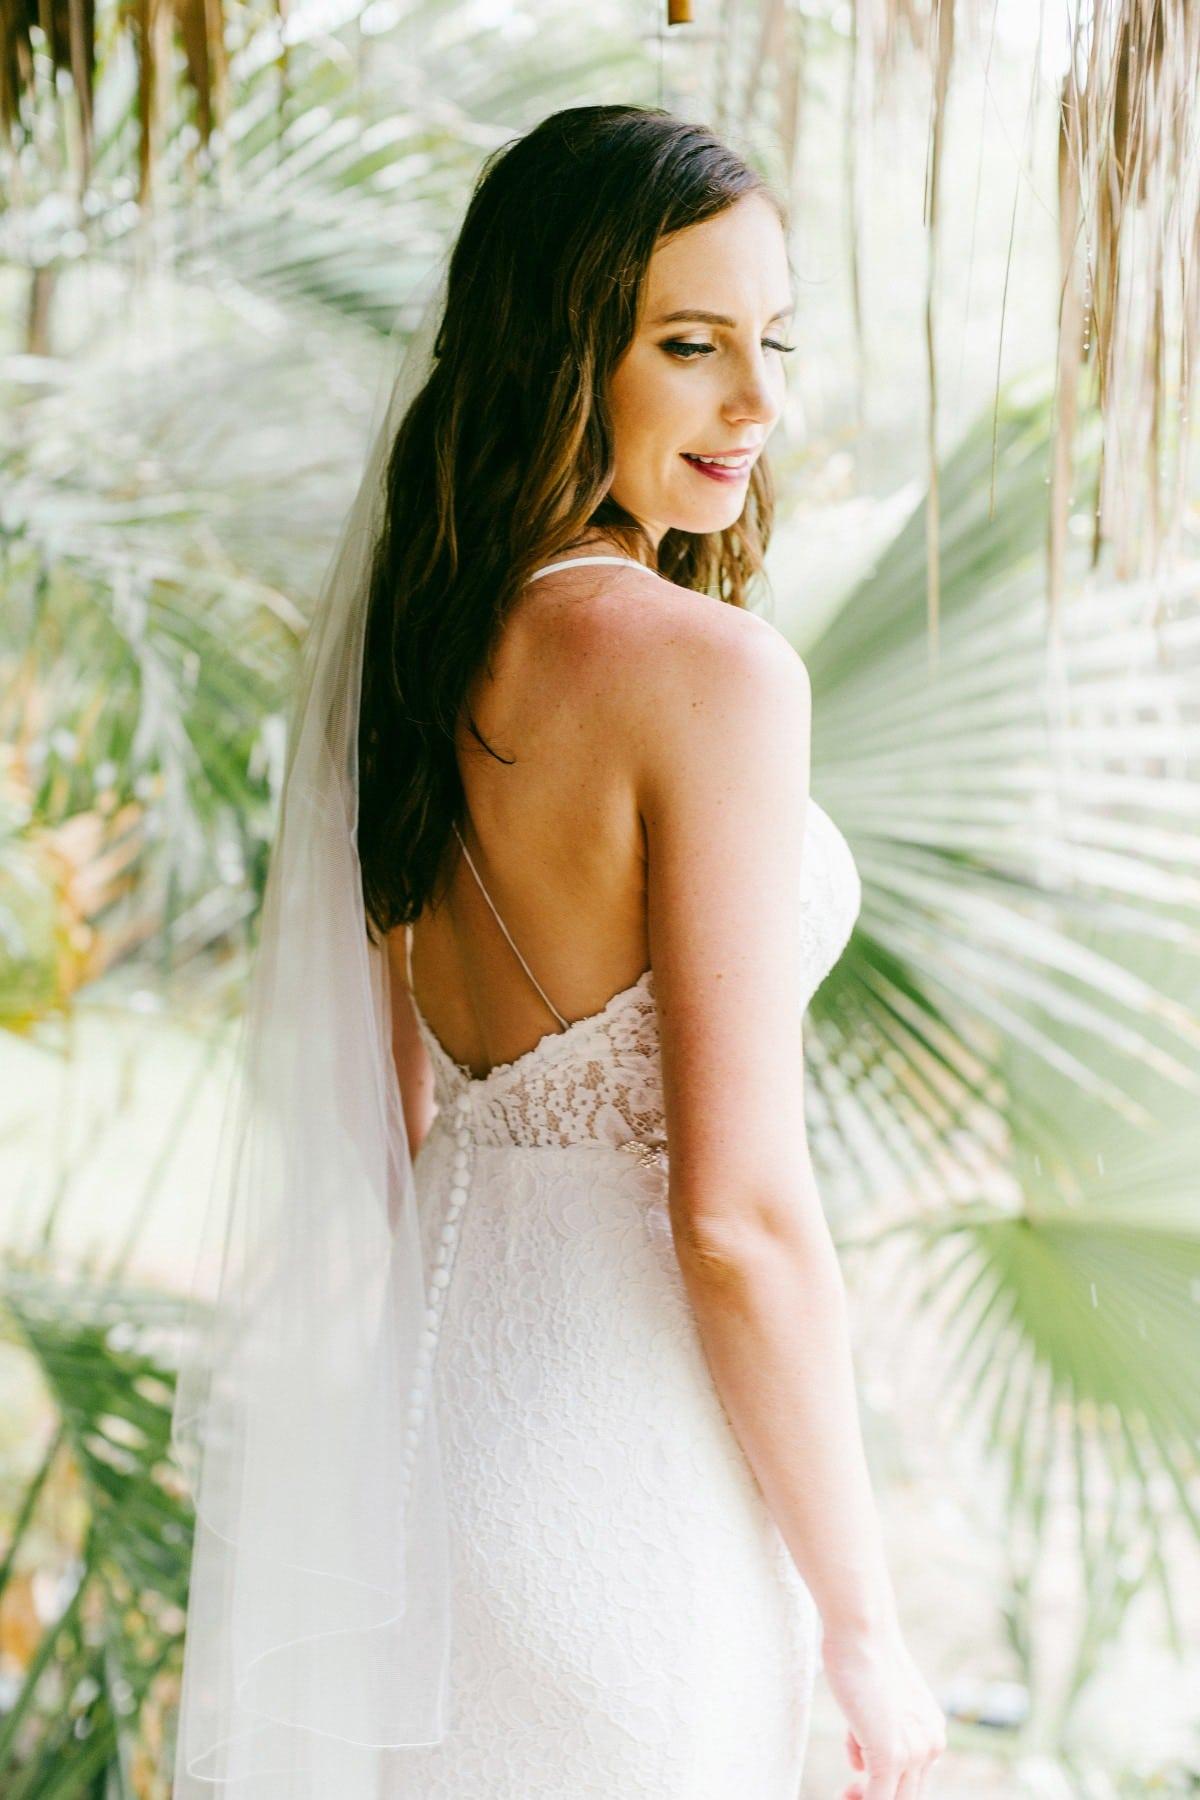 The bride dress Destination wedding Costa Rica